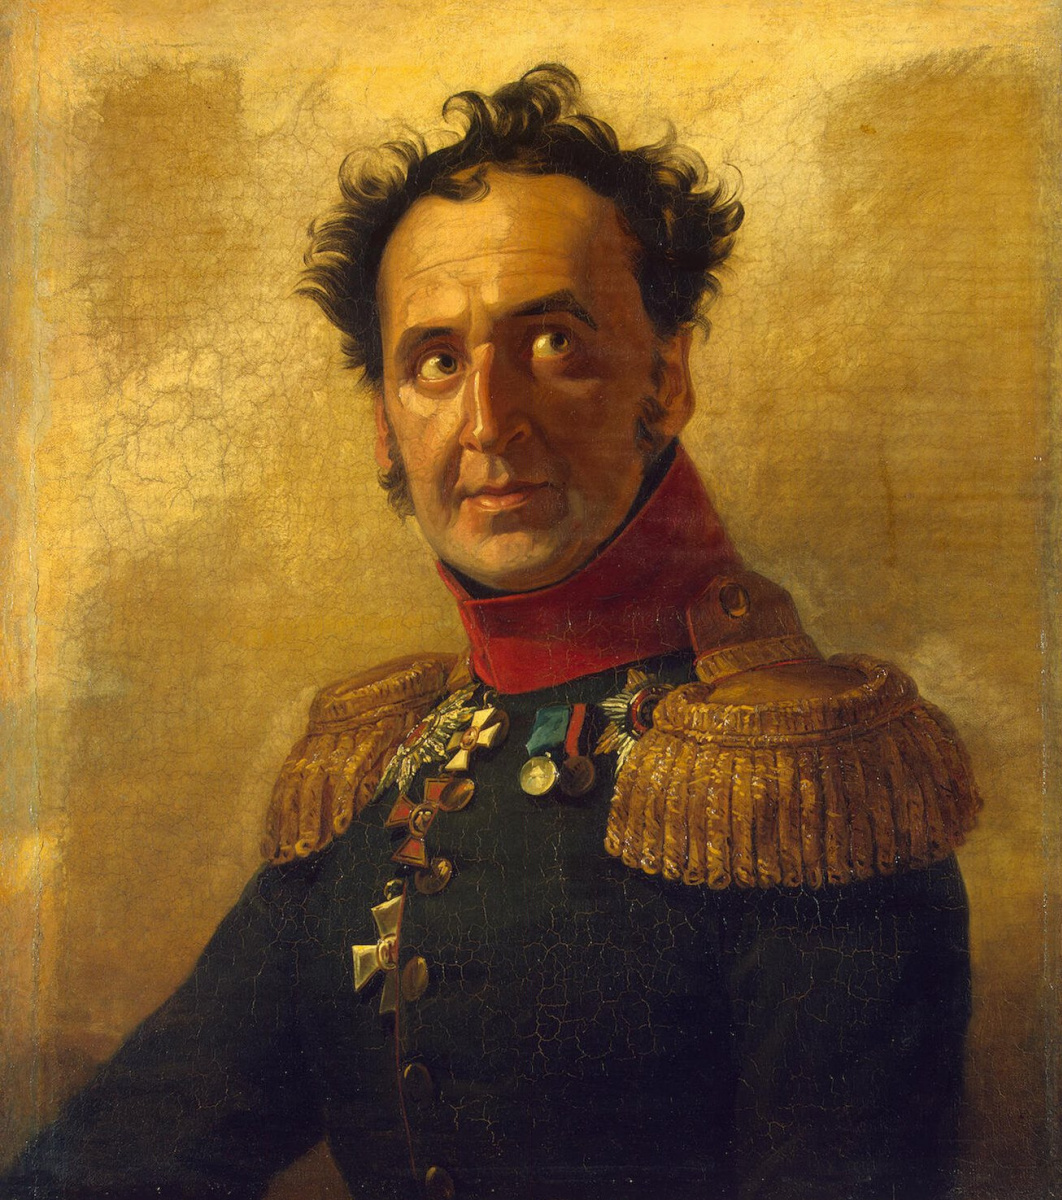 Джордж Доу. Портрет Федора Ивановича Талызина